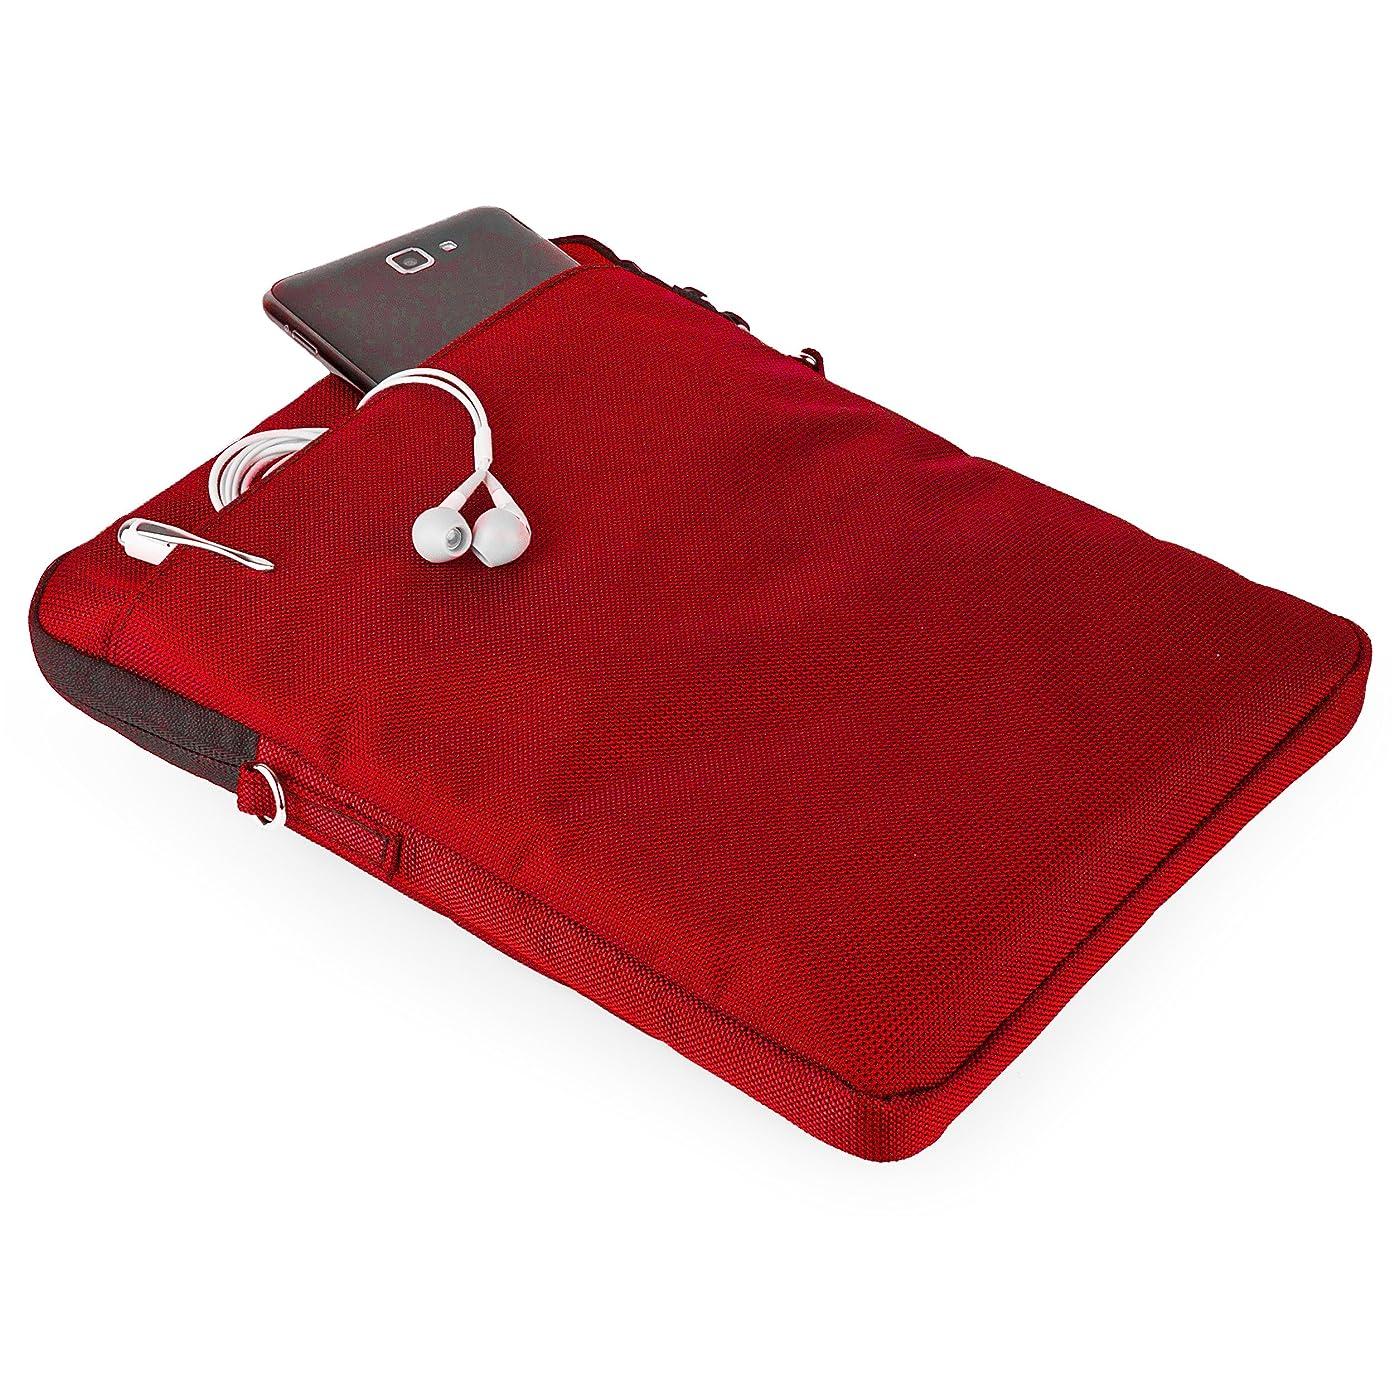 VanGoddy Hydei Shoulder Bag Sleeve for Asus Chromebook Flip C100 10.1 inch Laptops (Red)